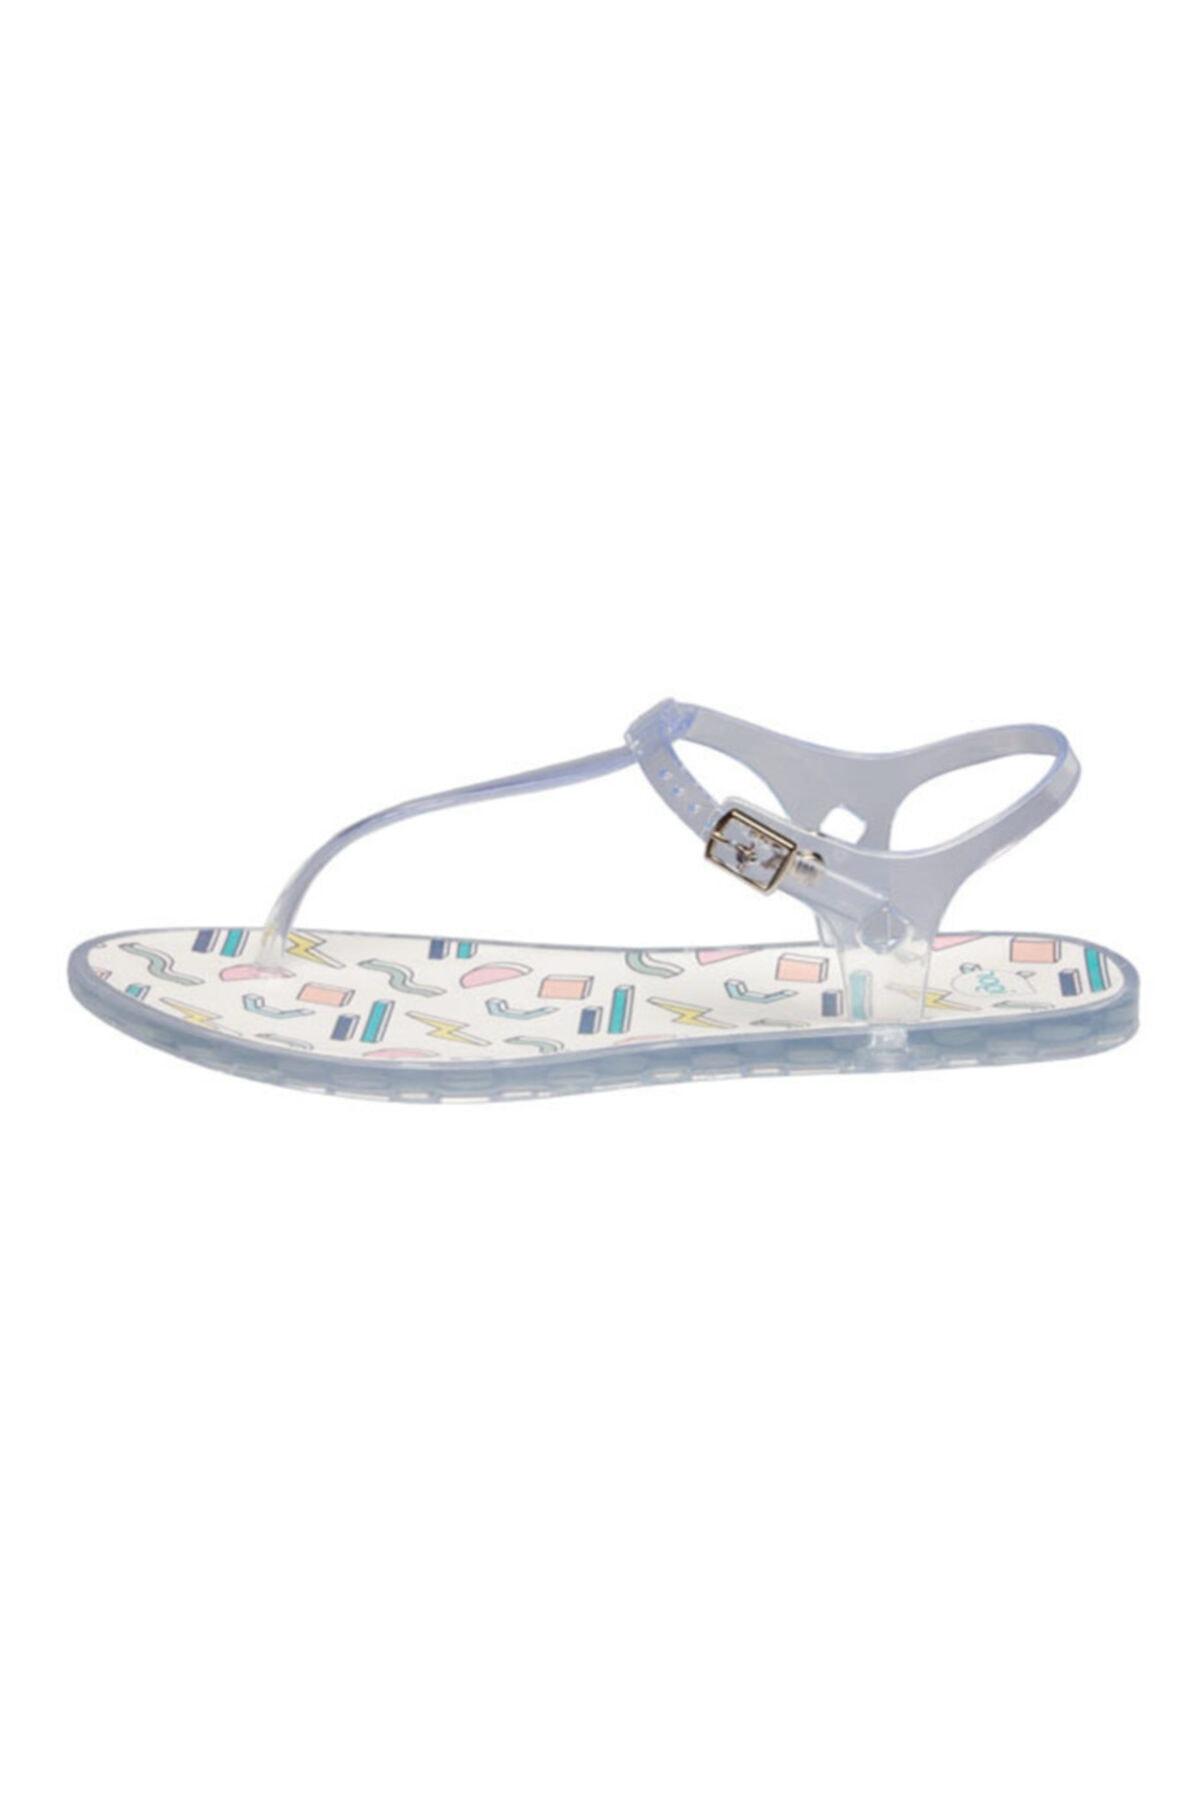 IGOR Ursula Shapes Sandalet 1